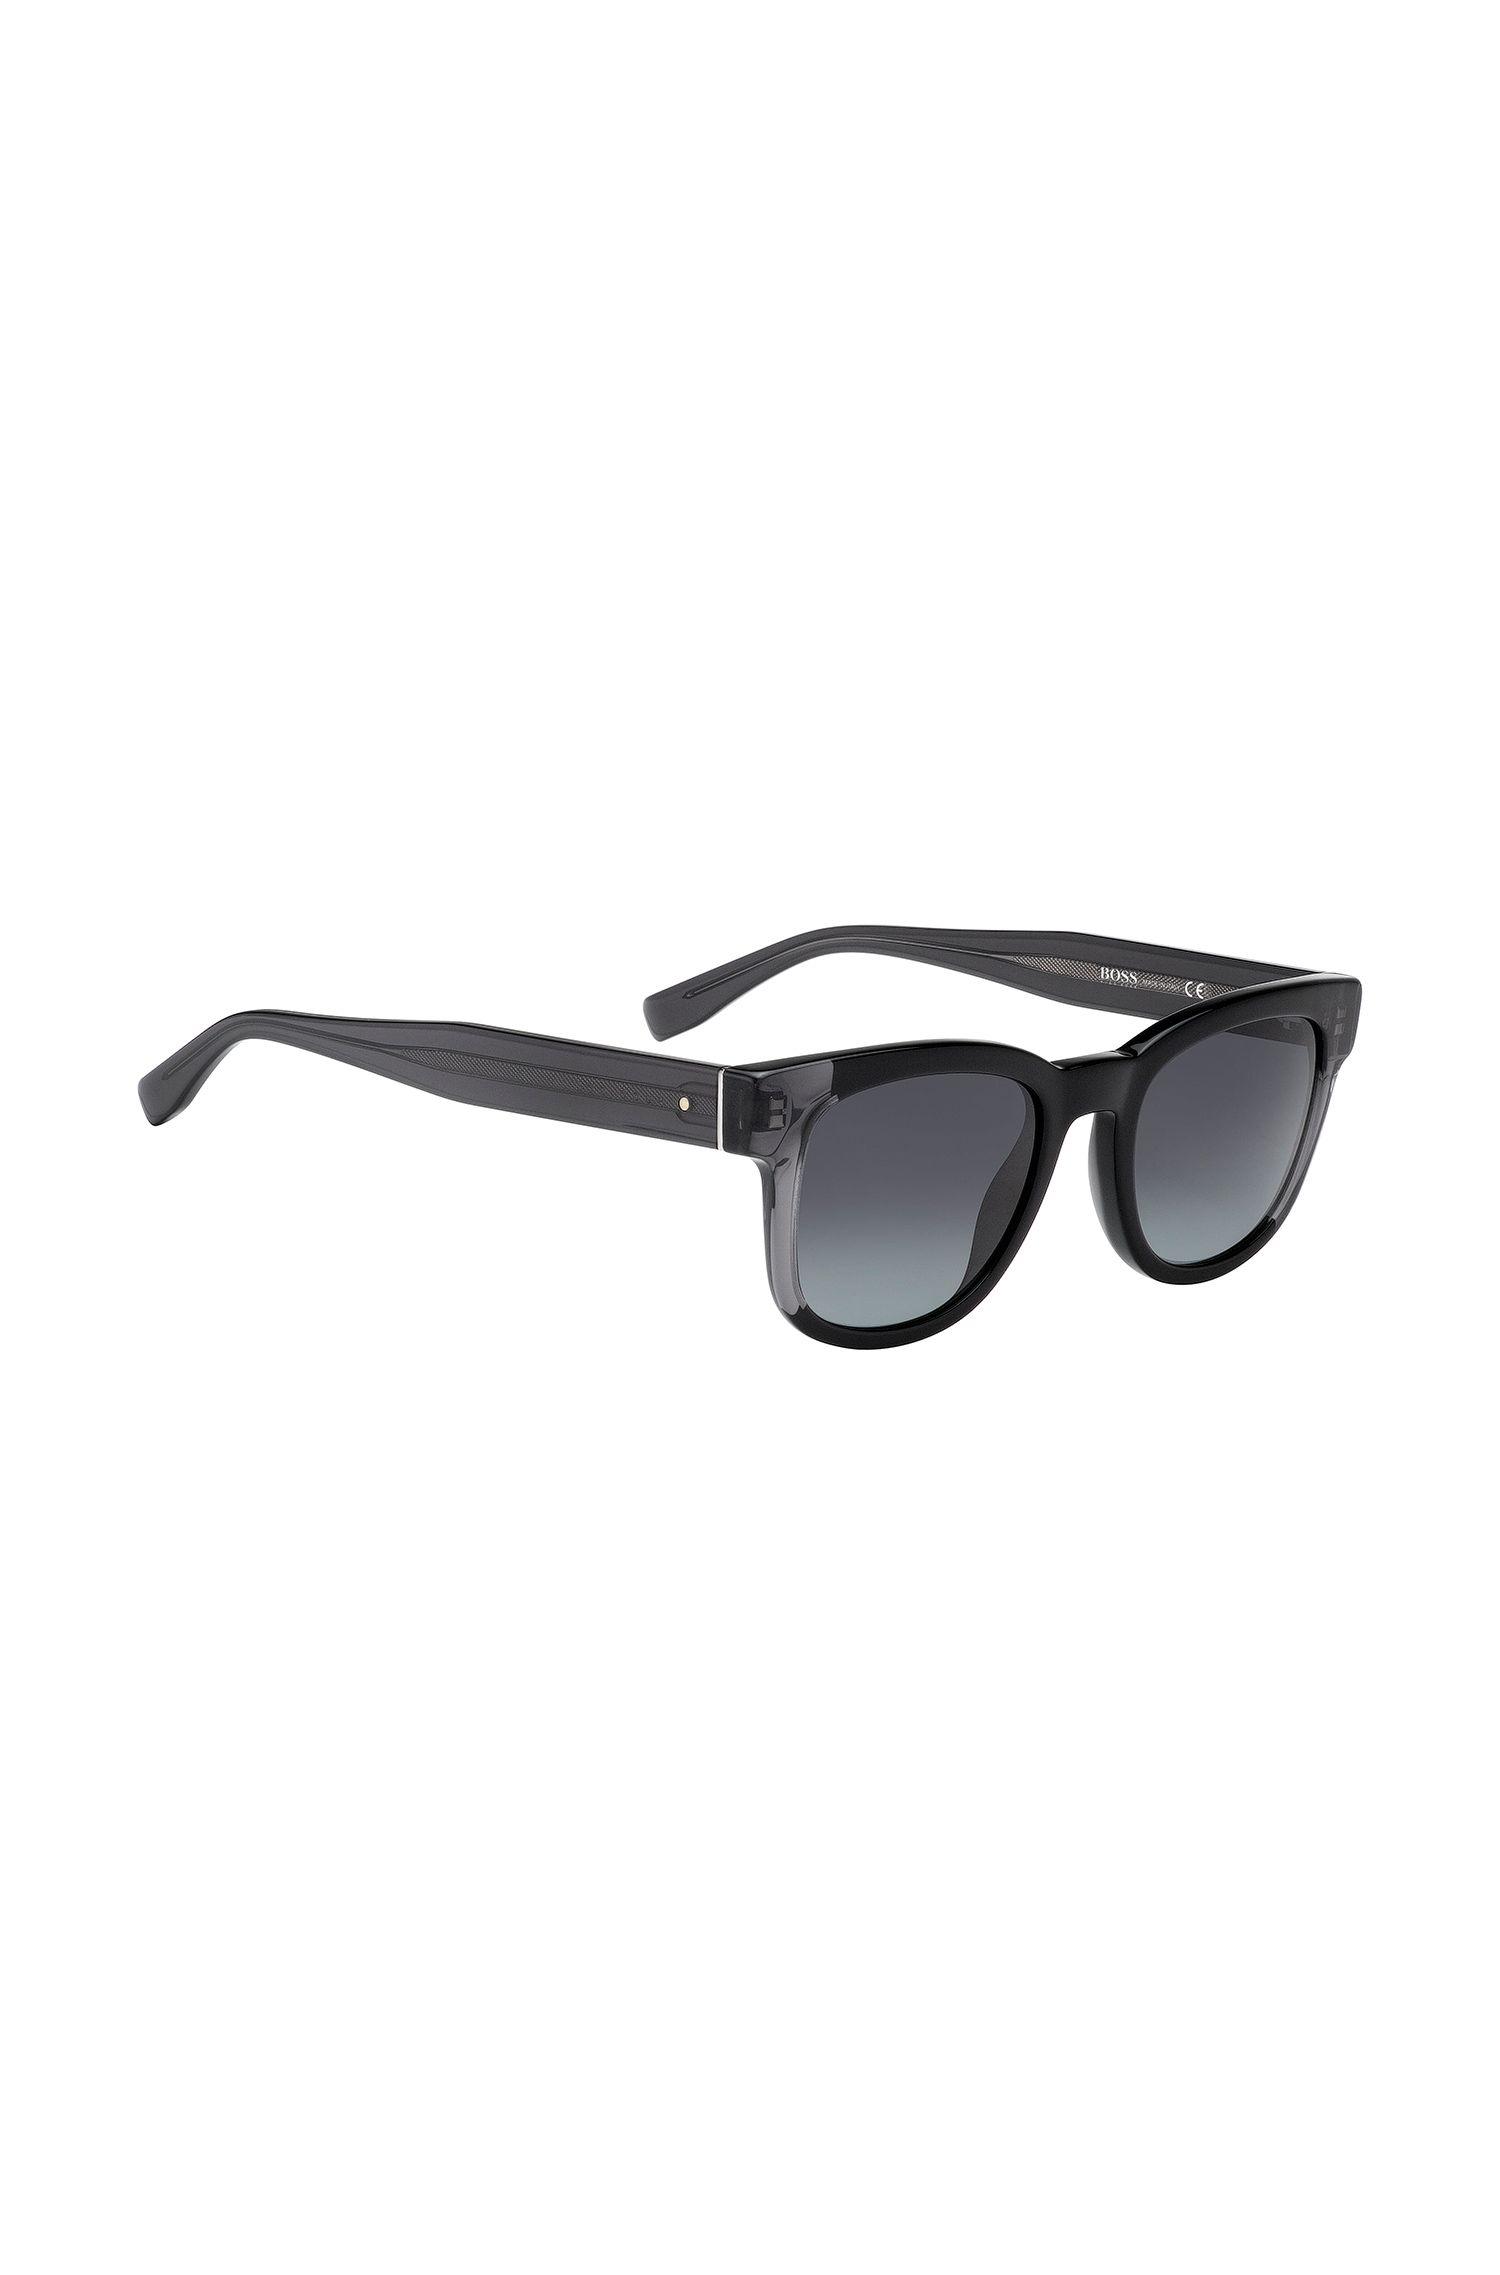 Gafas de sol: 'BOSS 0736/S'